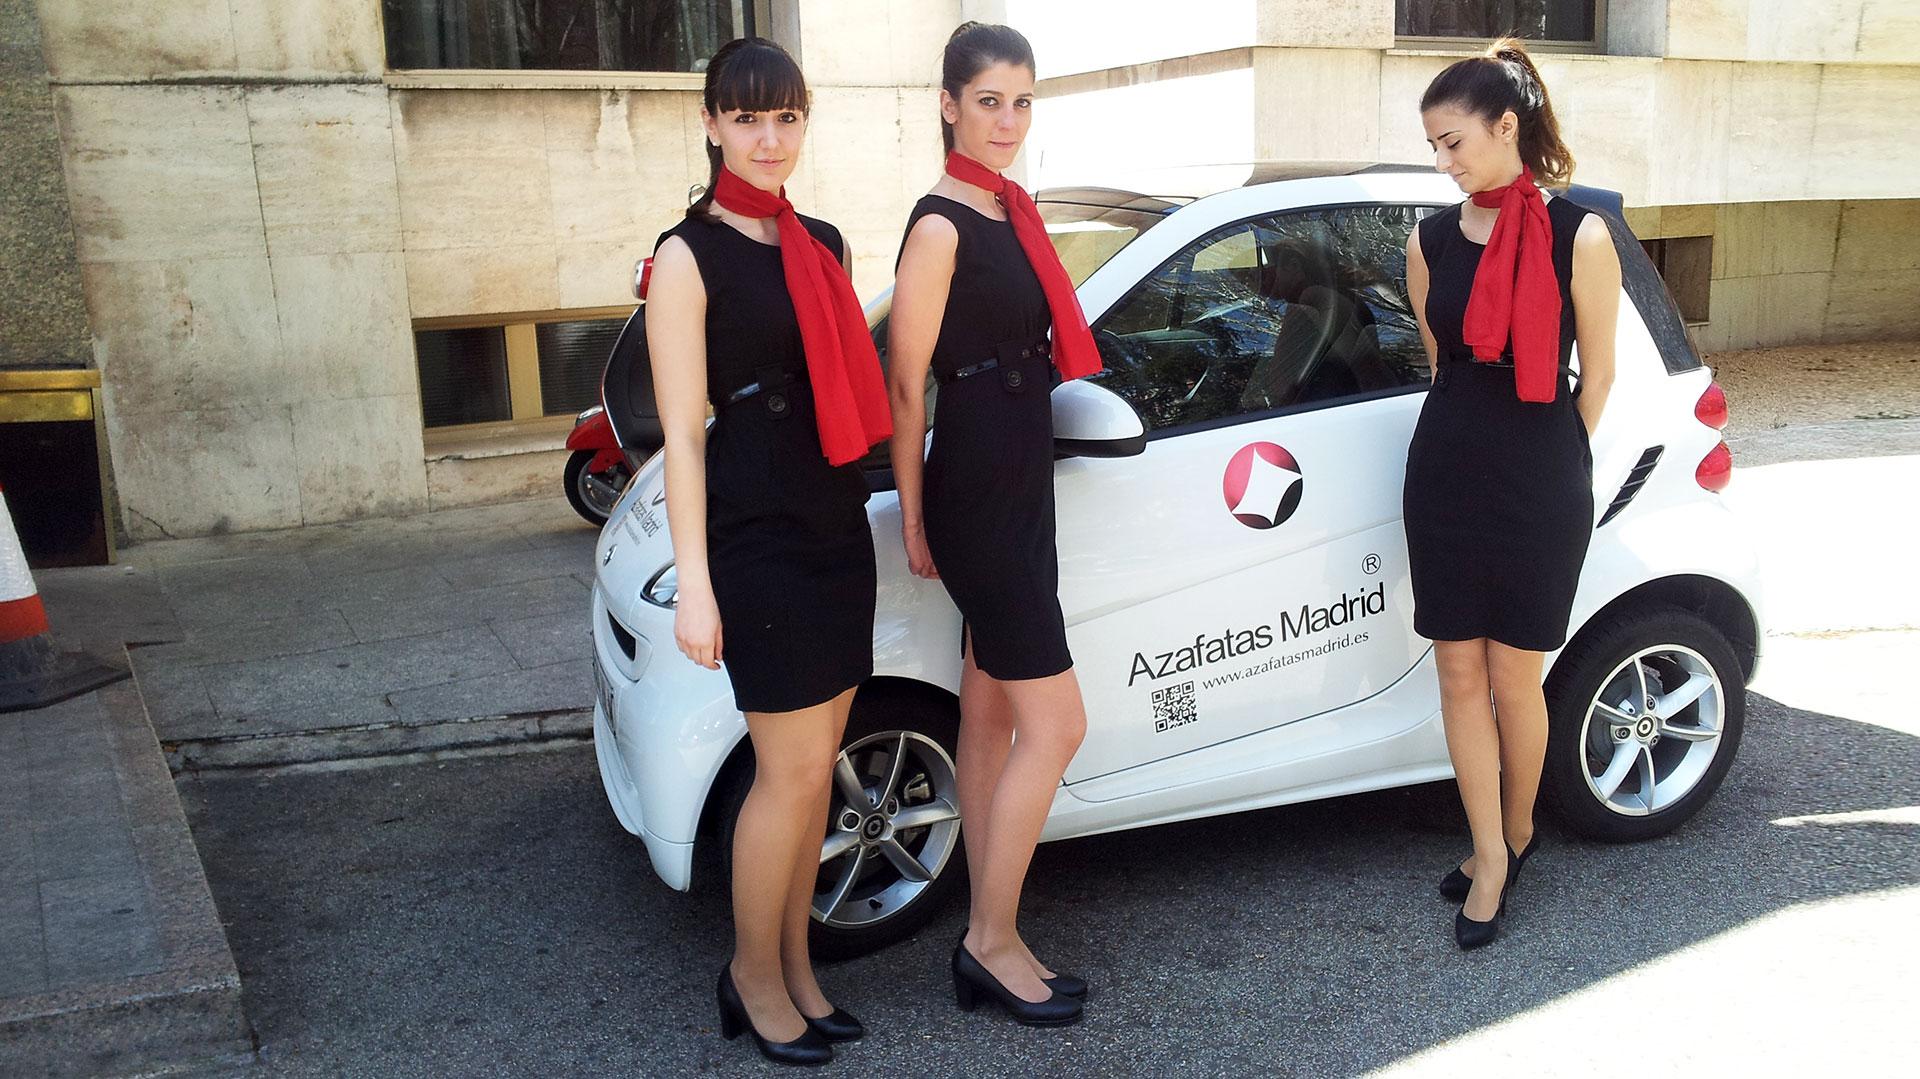 AZAFATAS MADRID ®